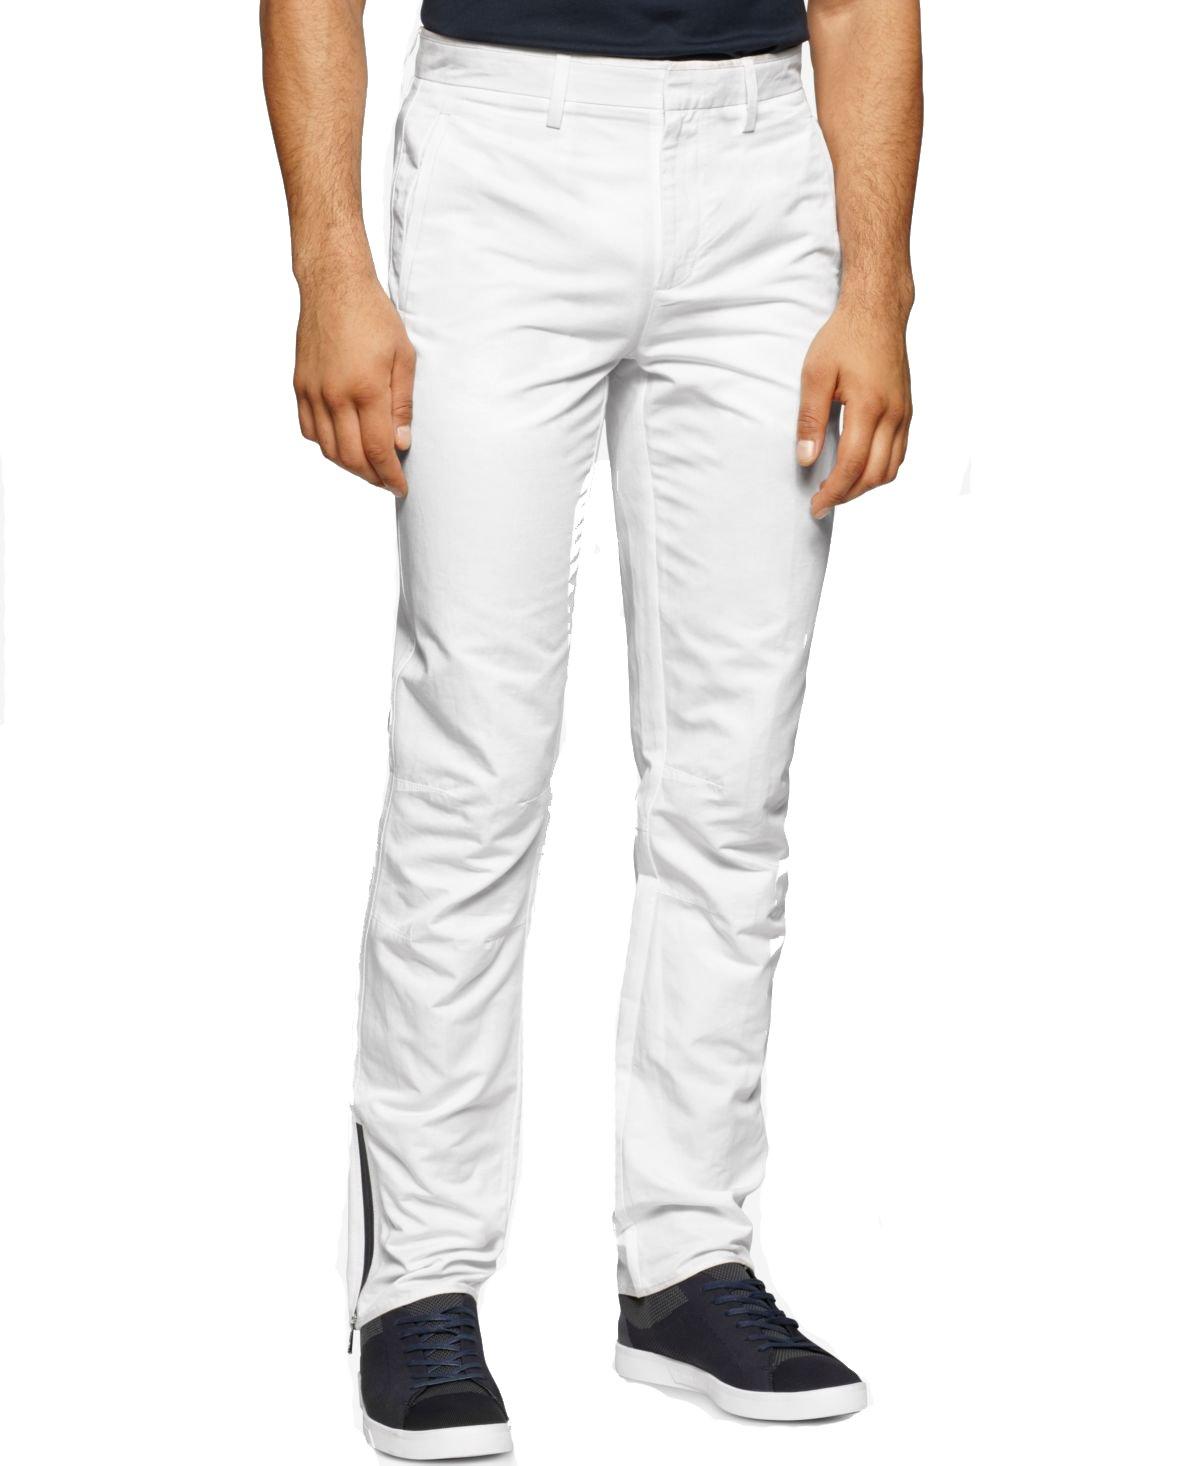 Calvin Klein Men's Premium Dress Pant, White, 38W 32L